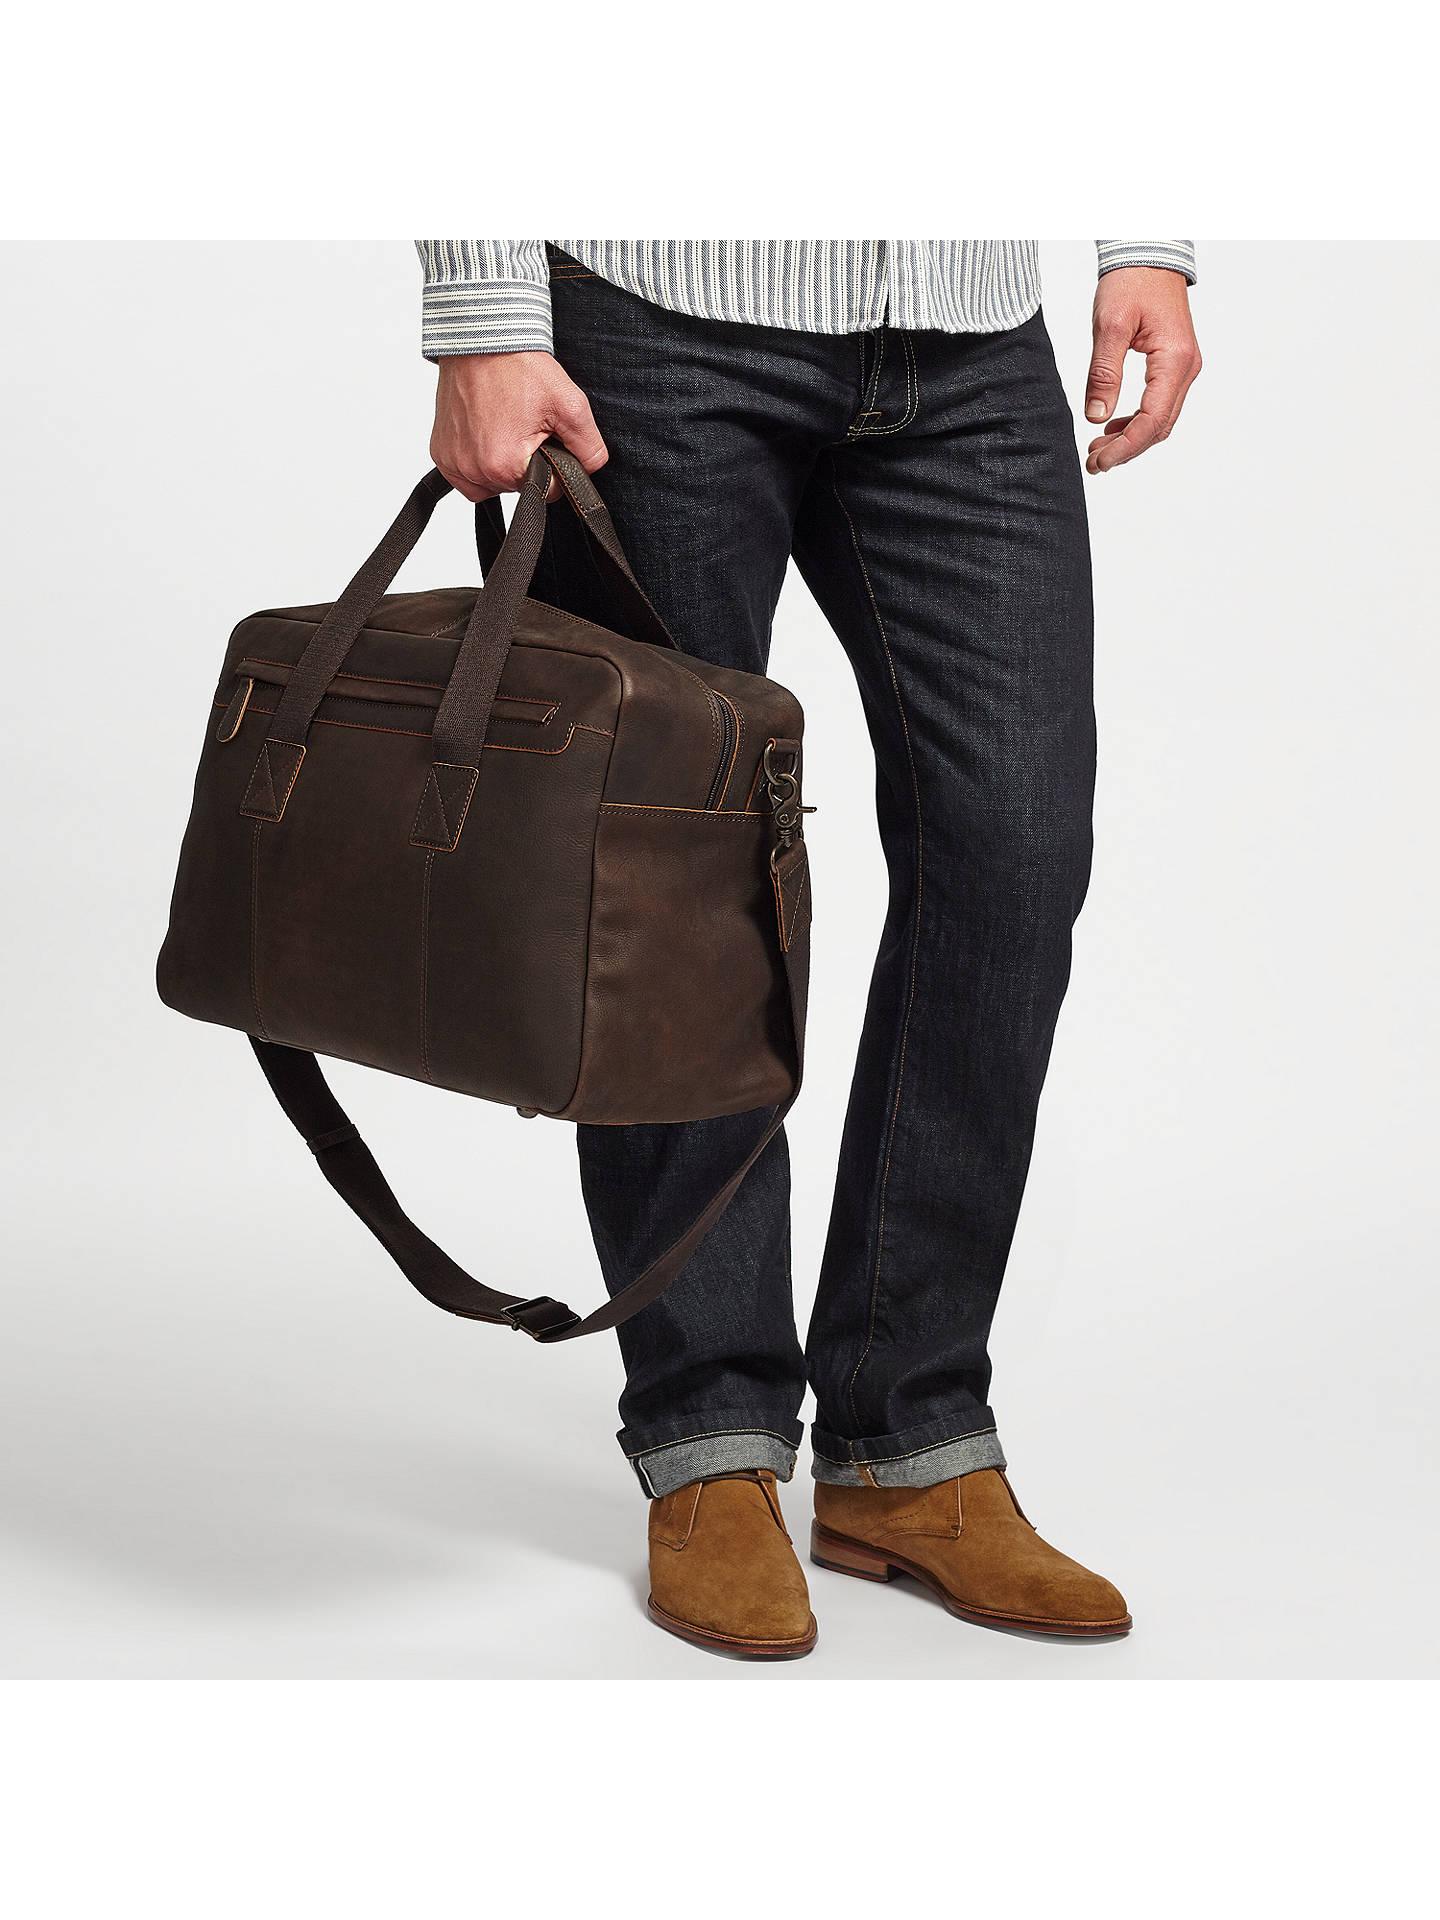 93878f961eb7 ... Buy John Lewis   Partners Toronto Leather Holdall